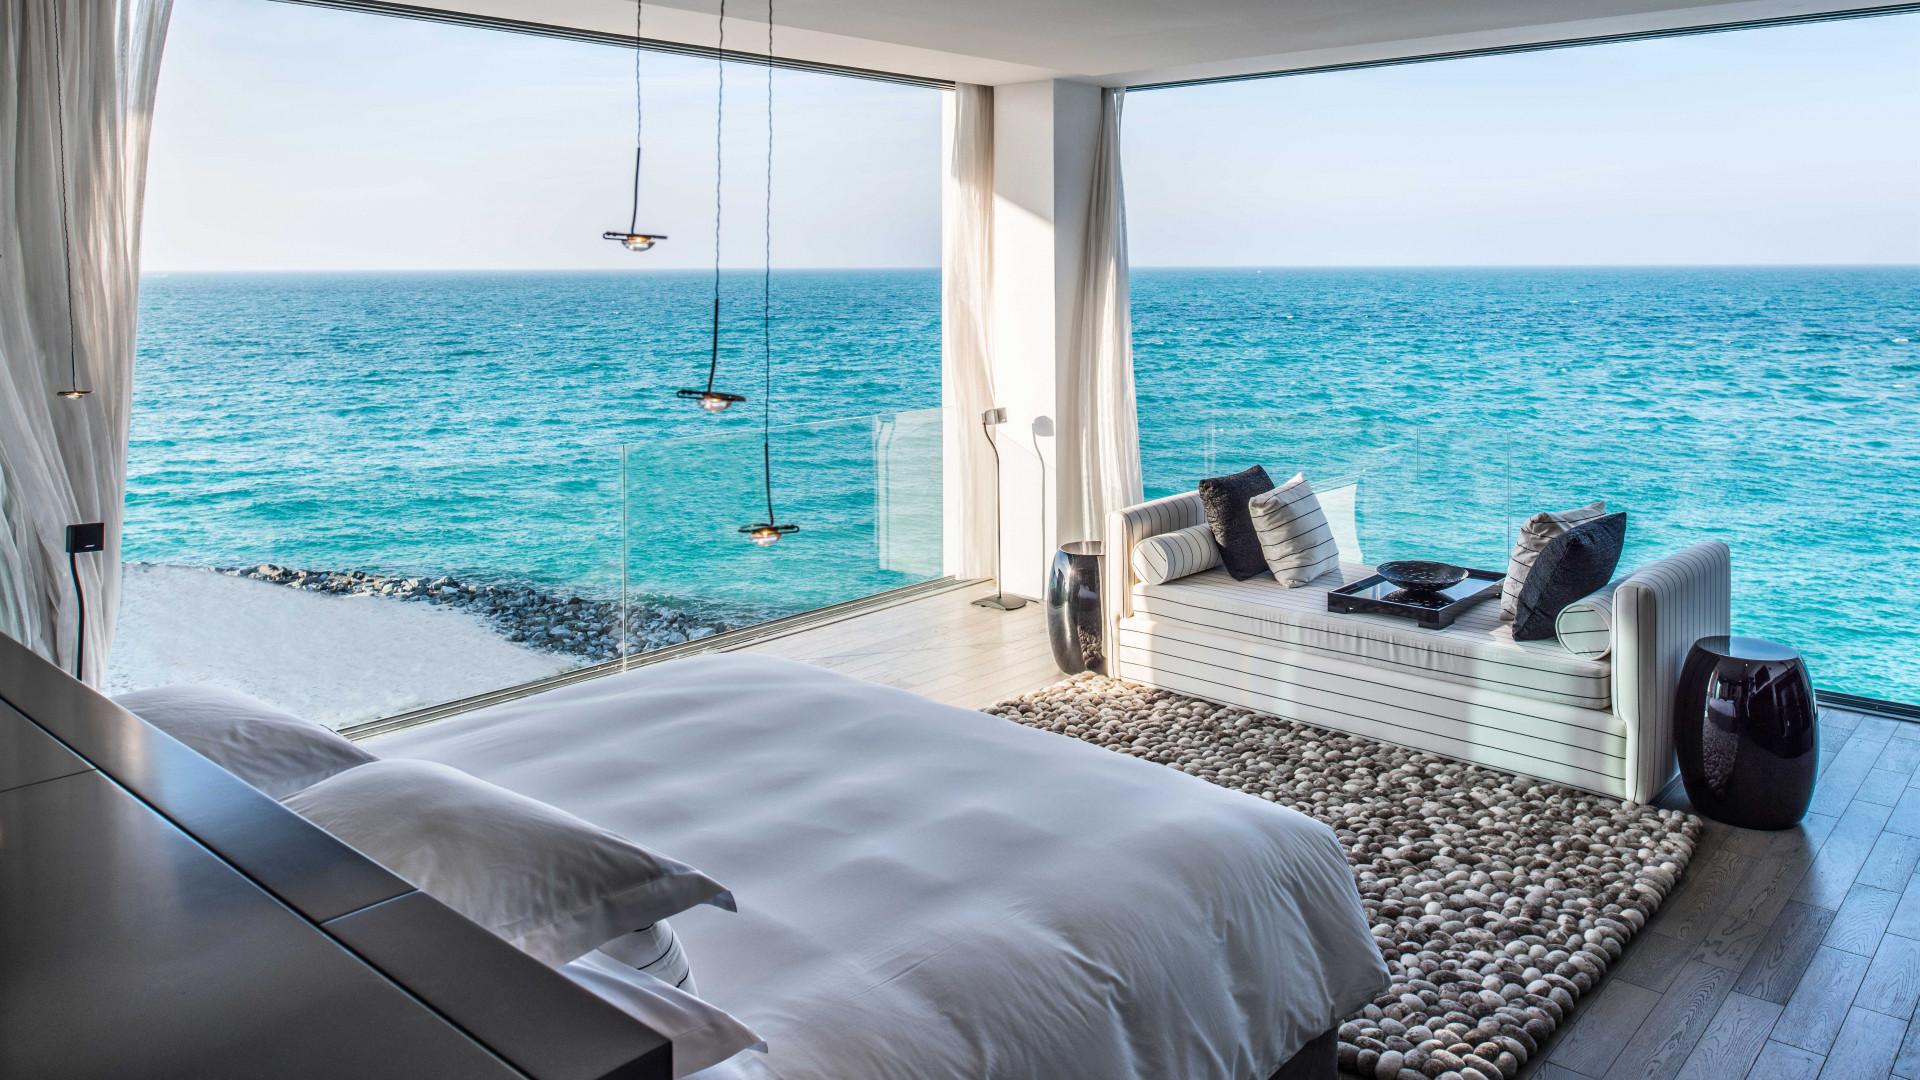 Rooms at Zaya Nurai Island in Abu Dhabi, UAE